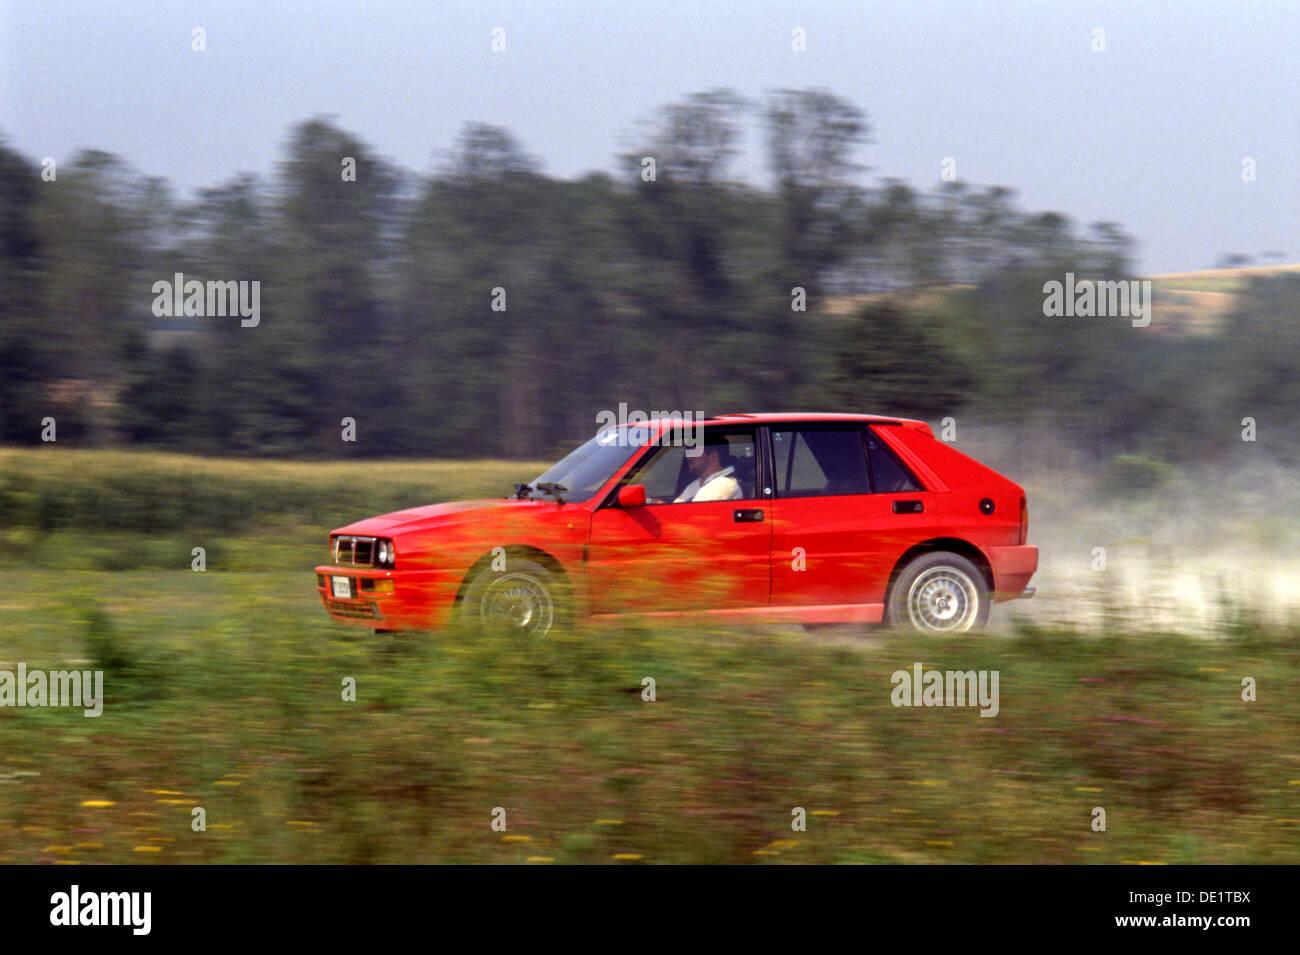 lancia delta integrale hf sport auto 4x4 4wd 1990 s in rot in